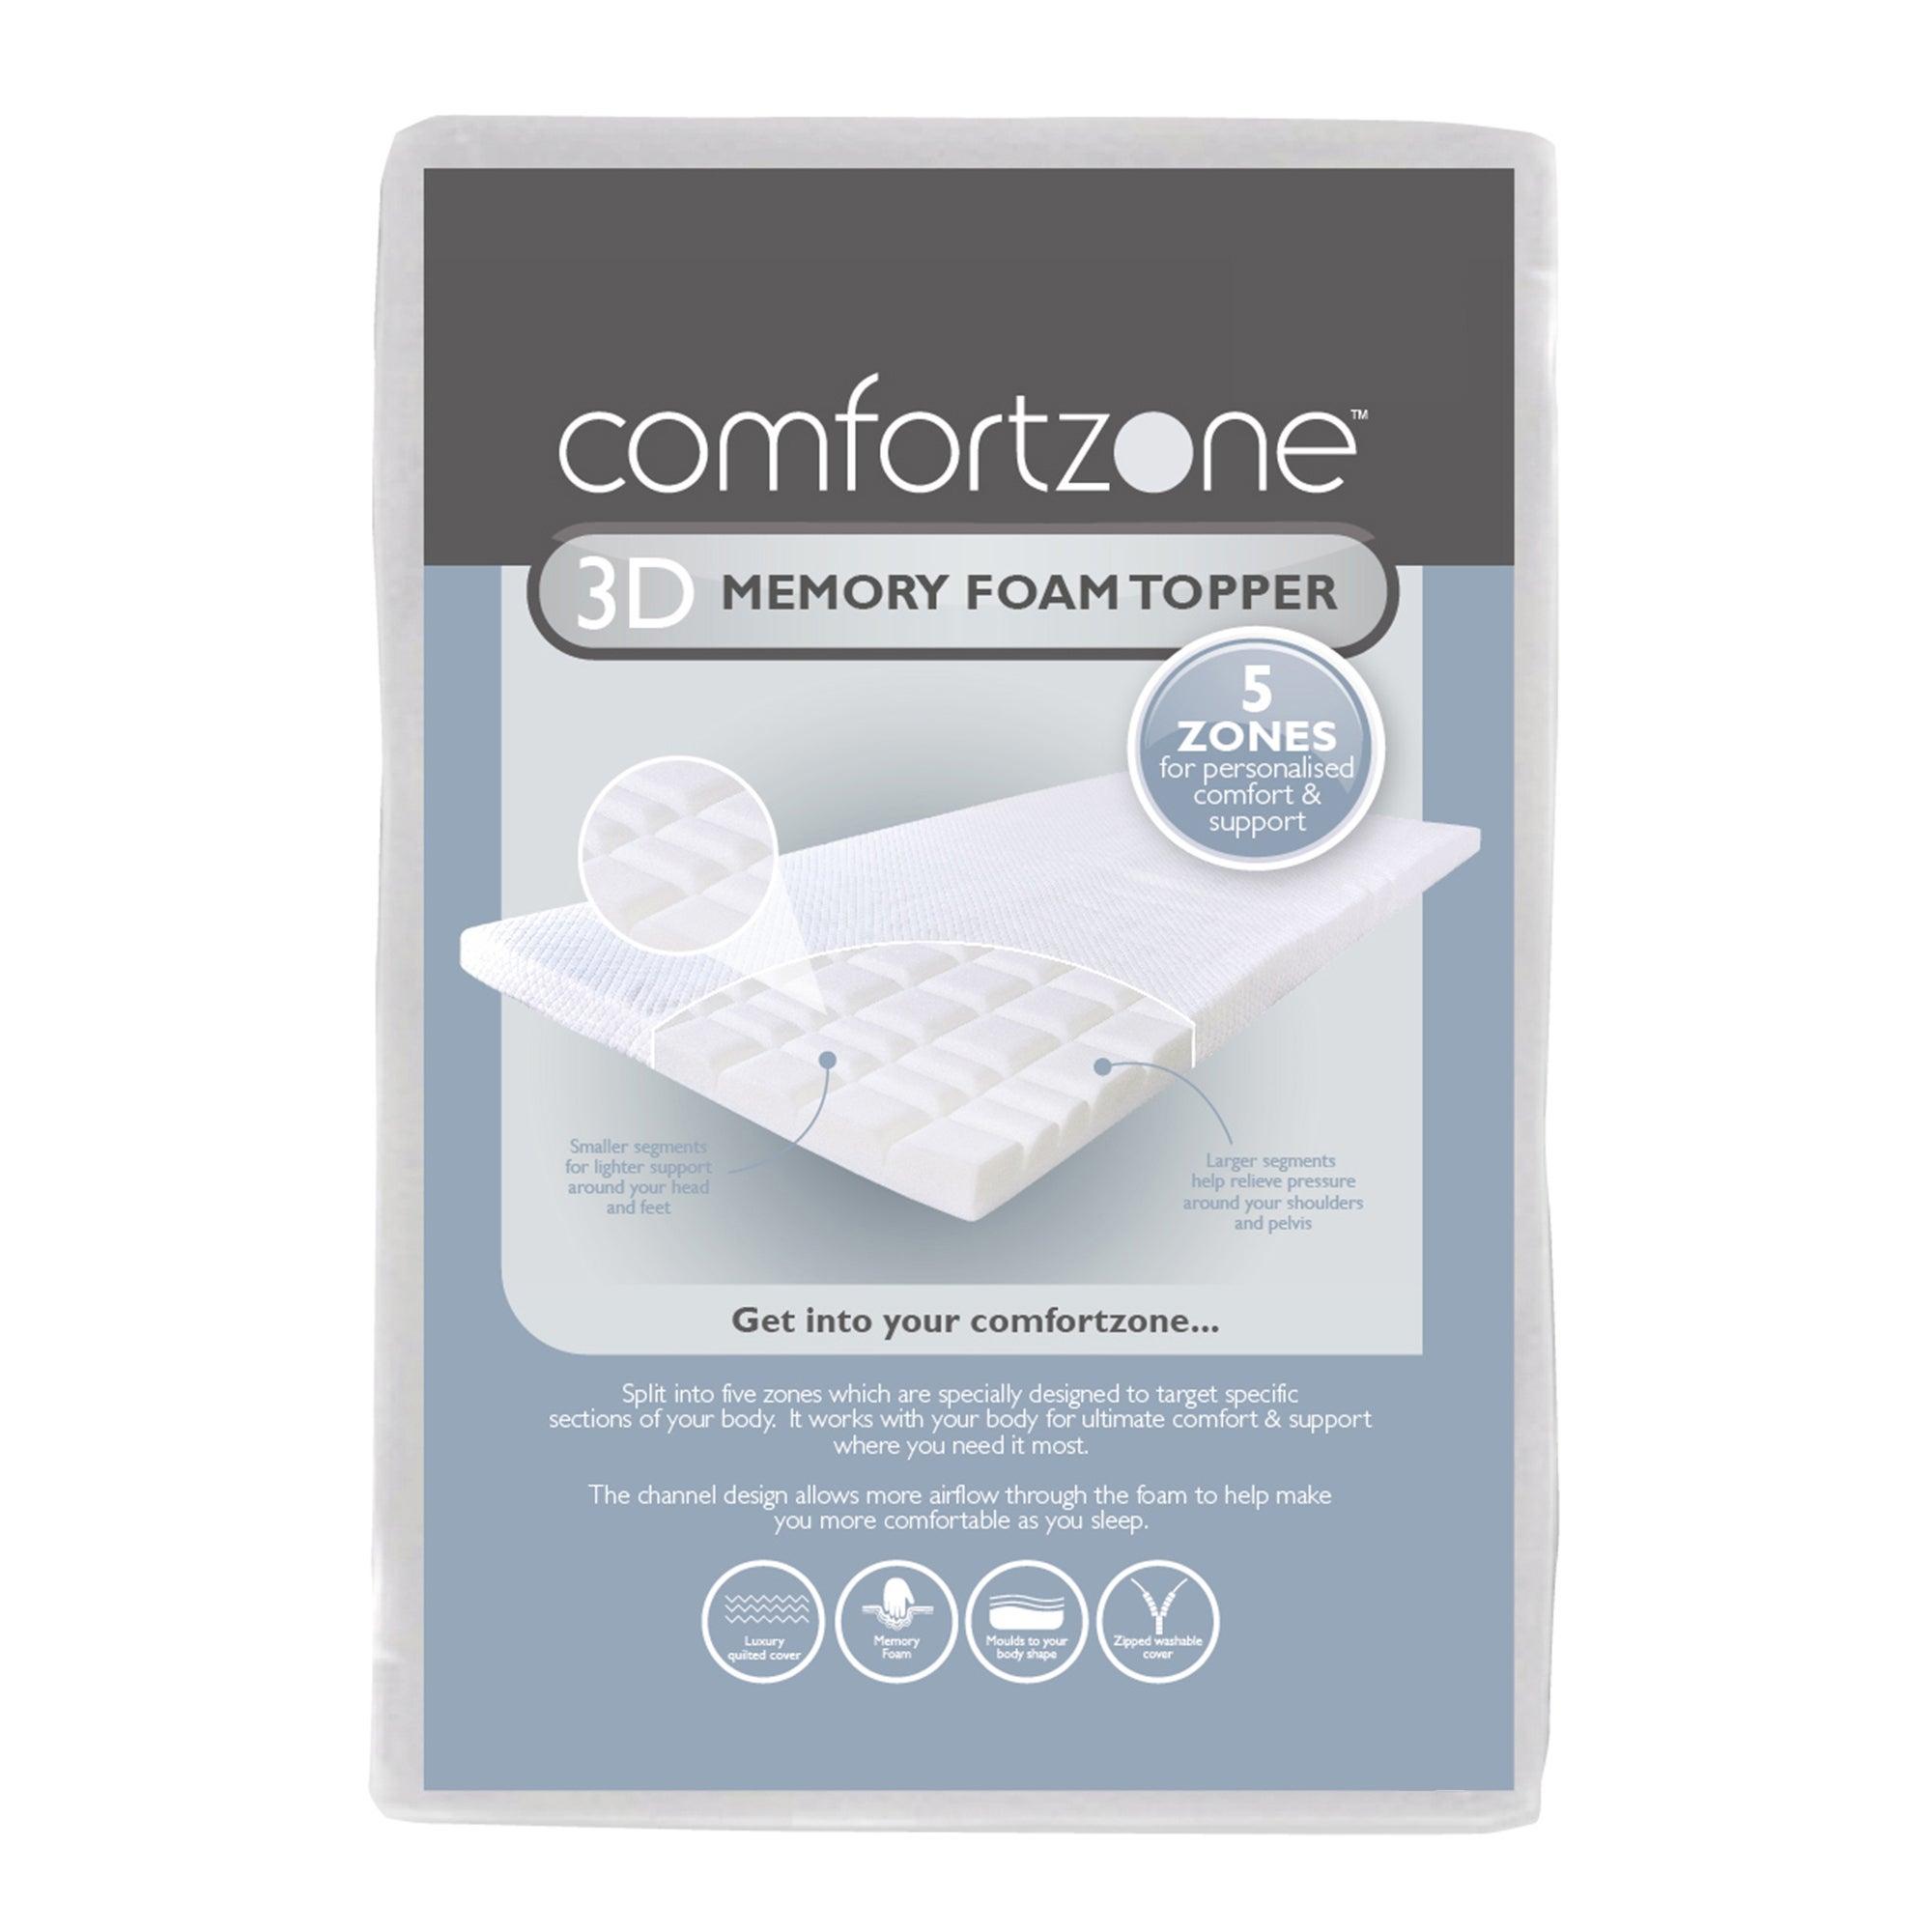 Comfortzone 3D Memory Foam Topper